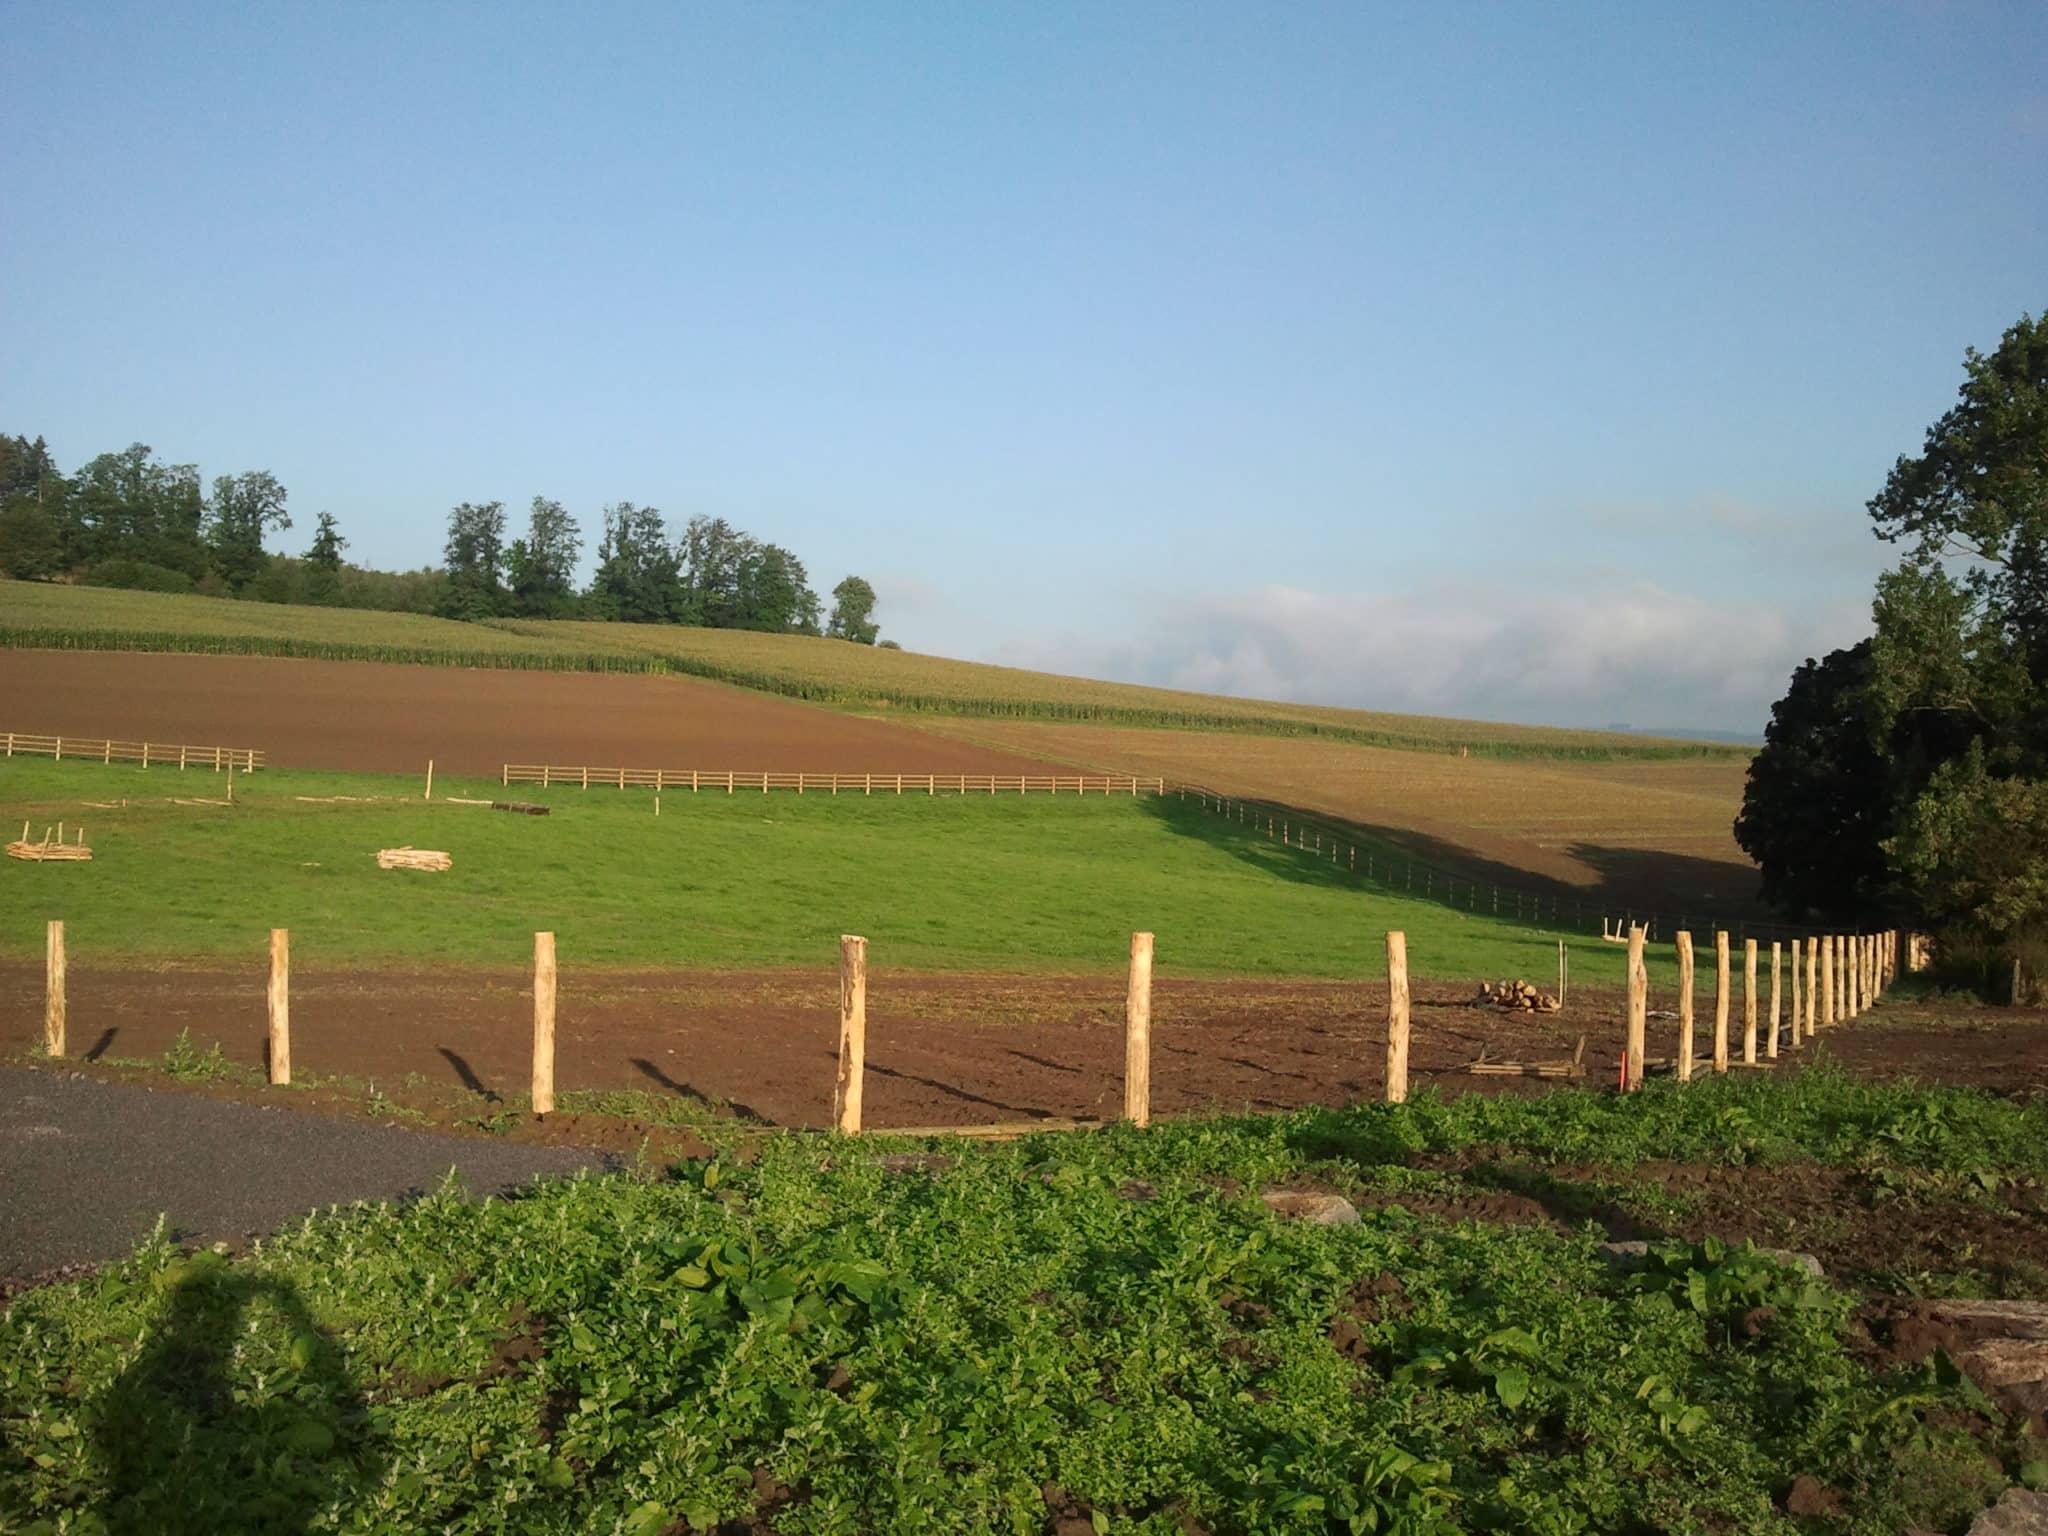 Koppelzaunbau im Sauerland